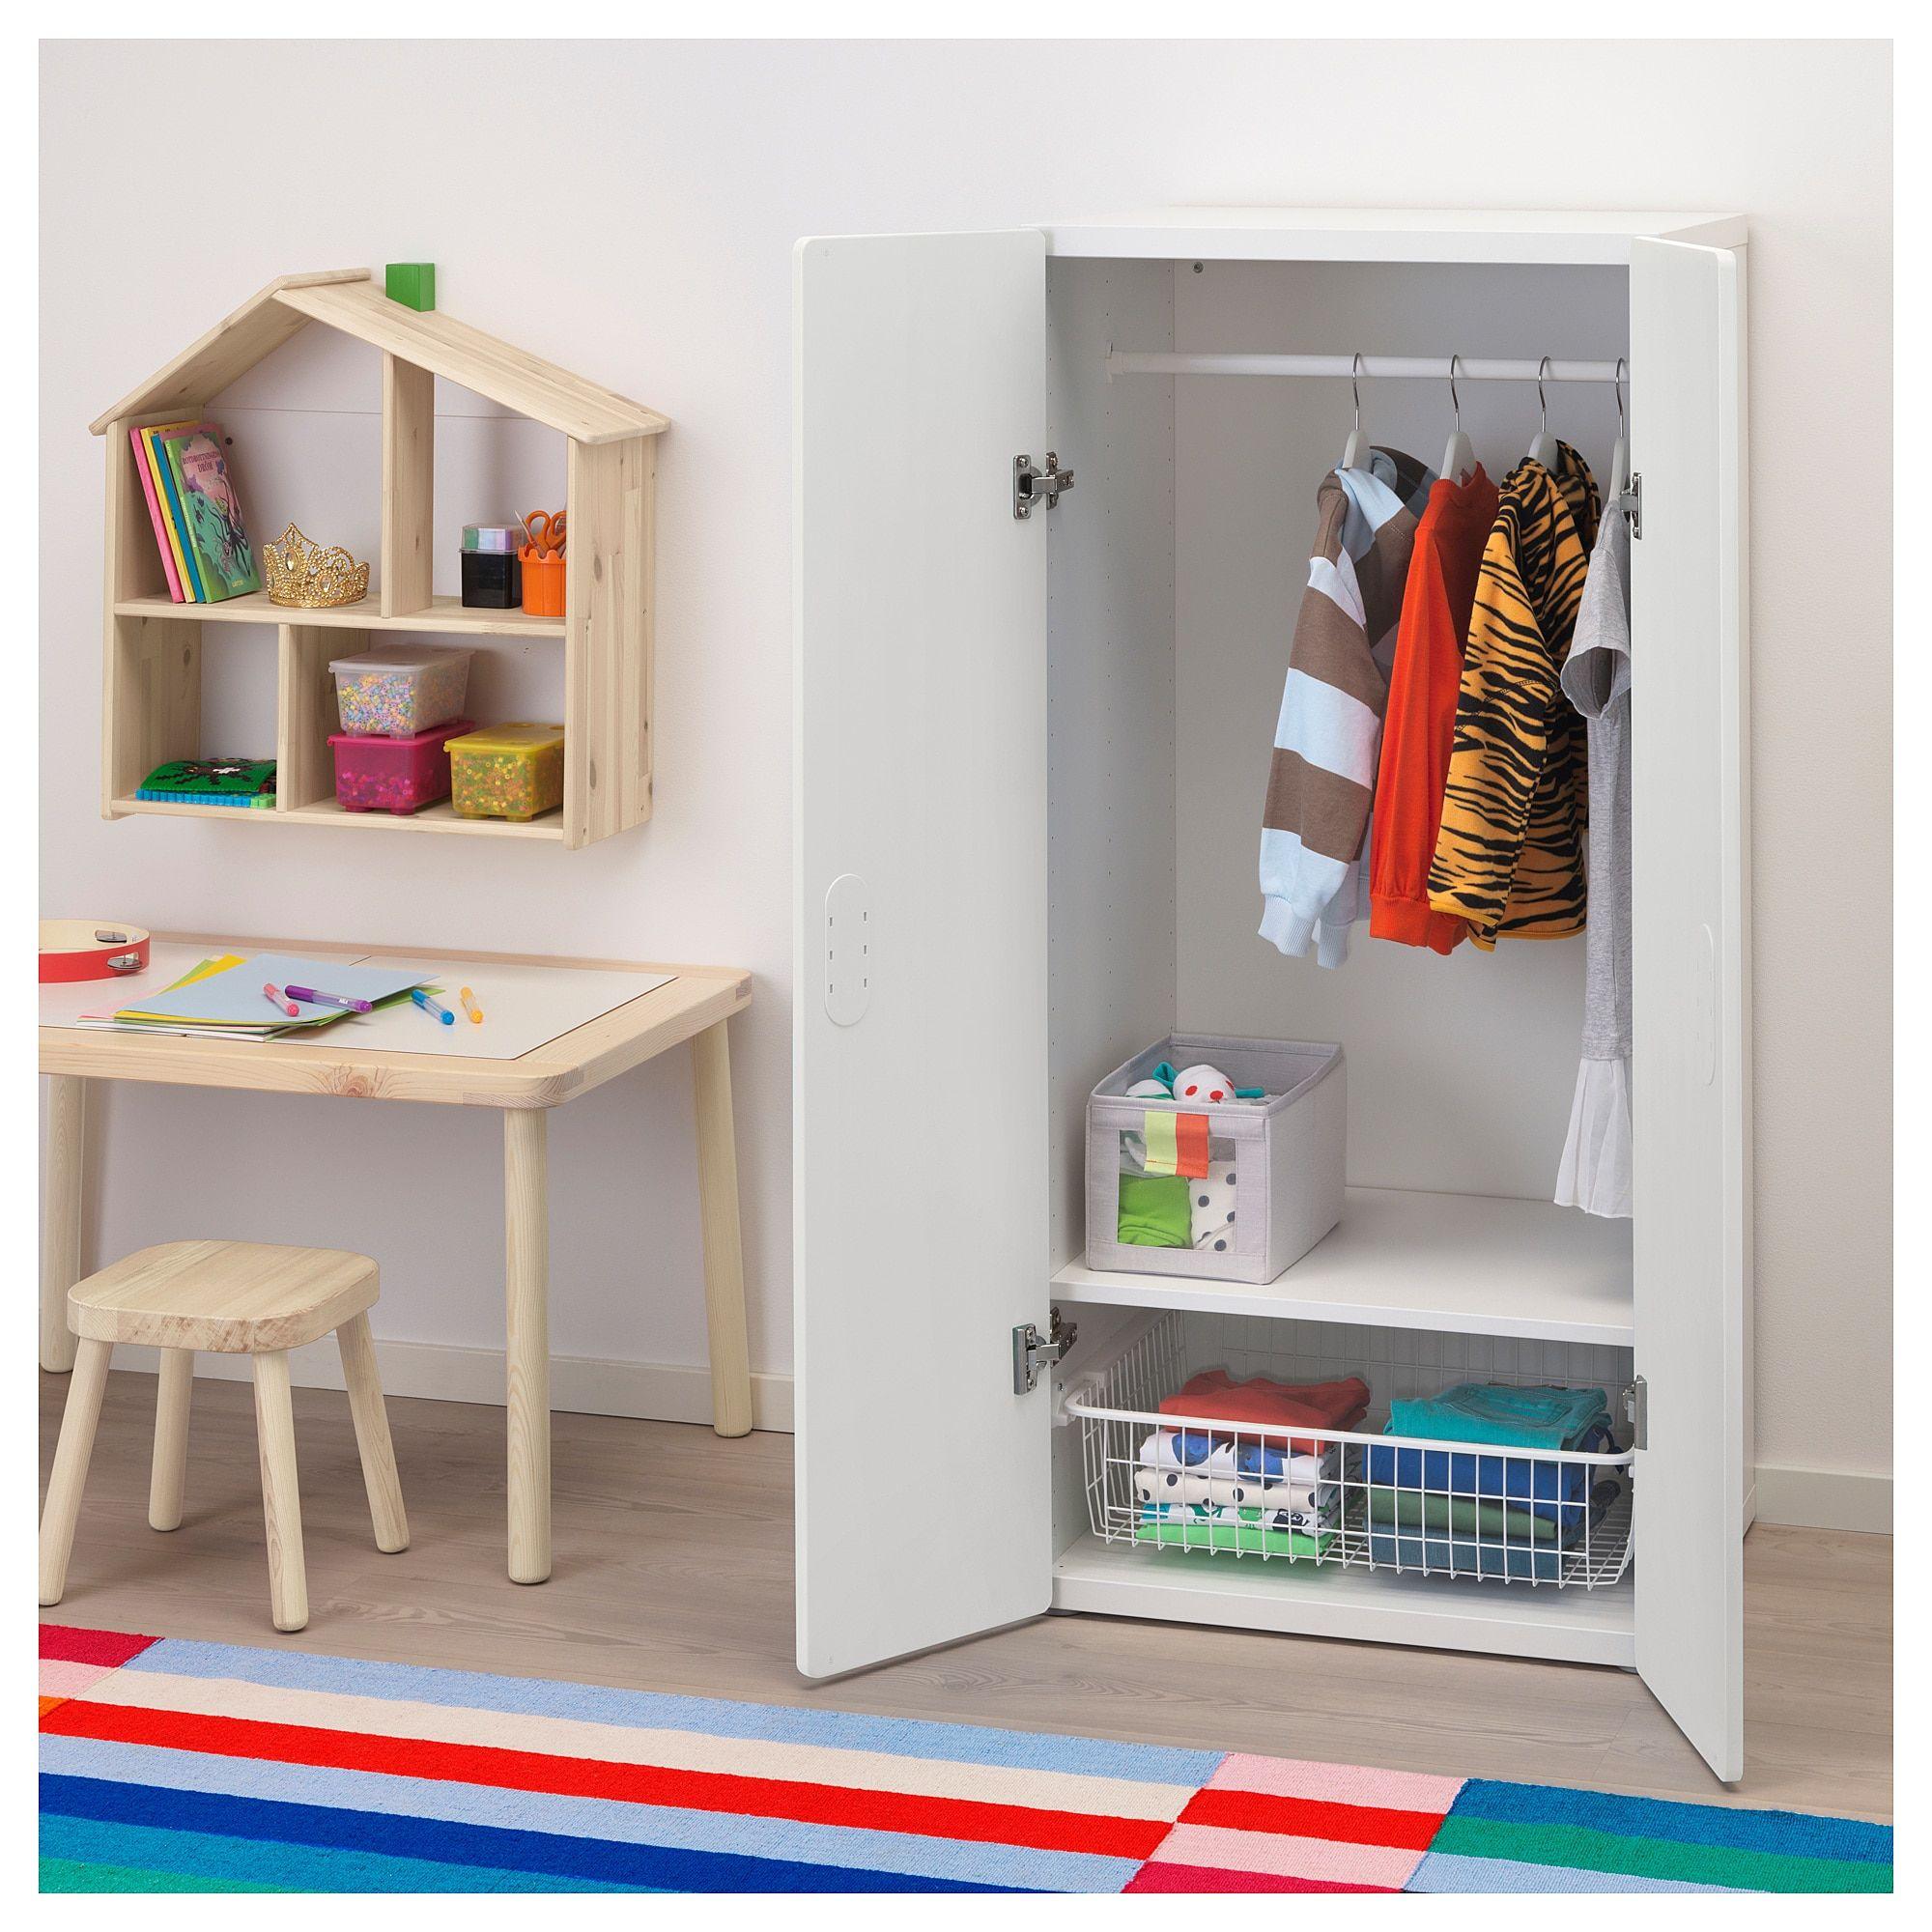 Ikea STUVA FRITIDS children's